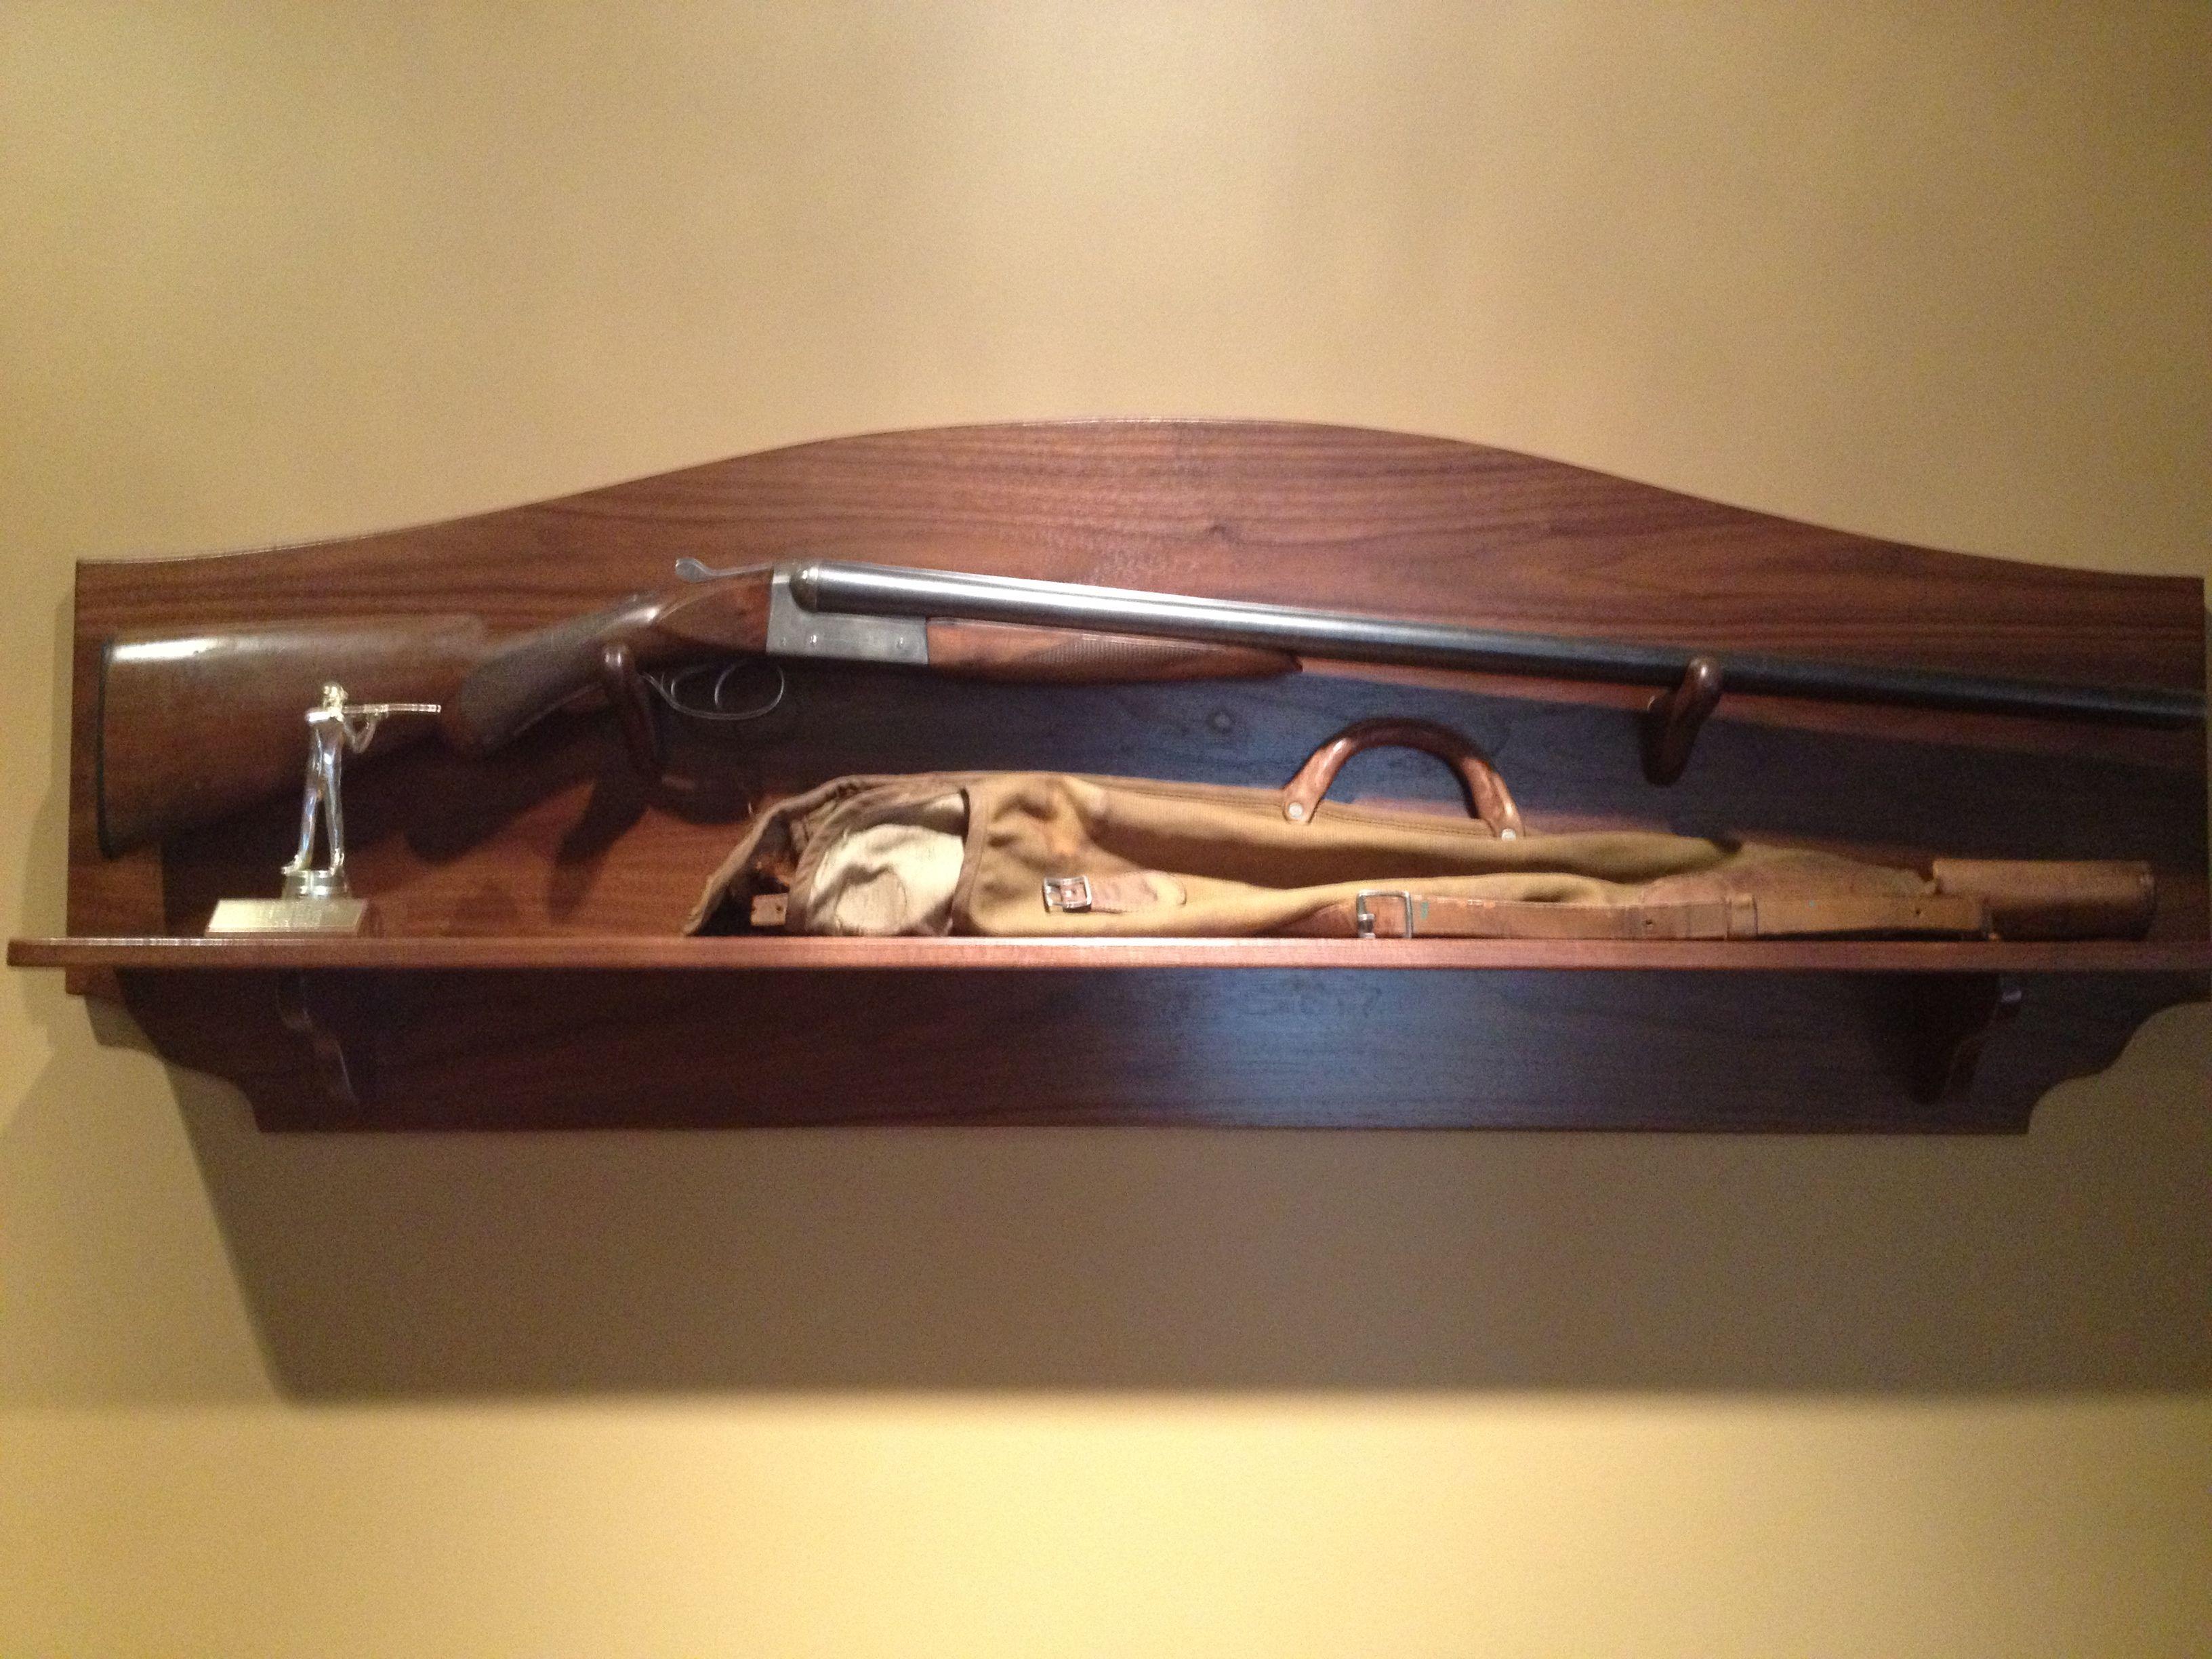 Gun Rack For Heirloom Shotgun Rifle Display Rifle Rack